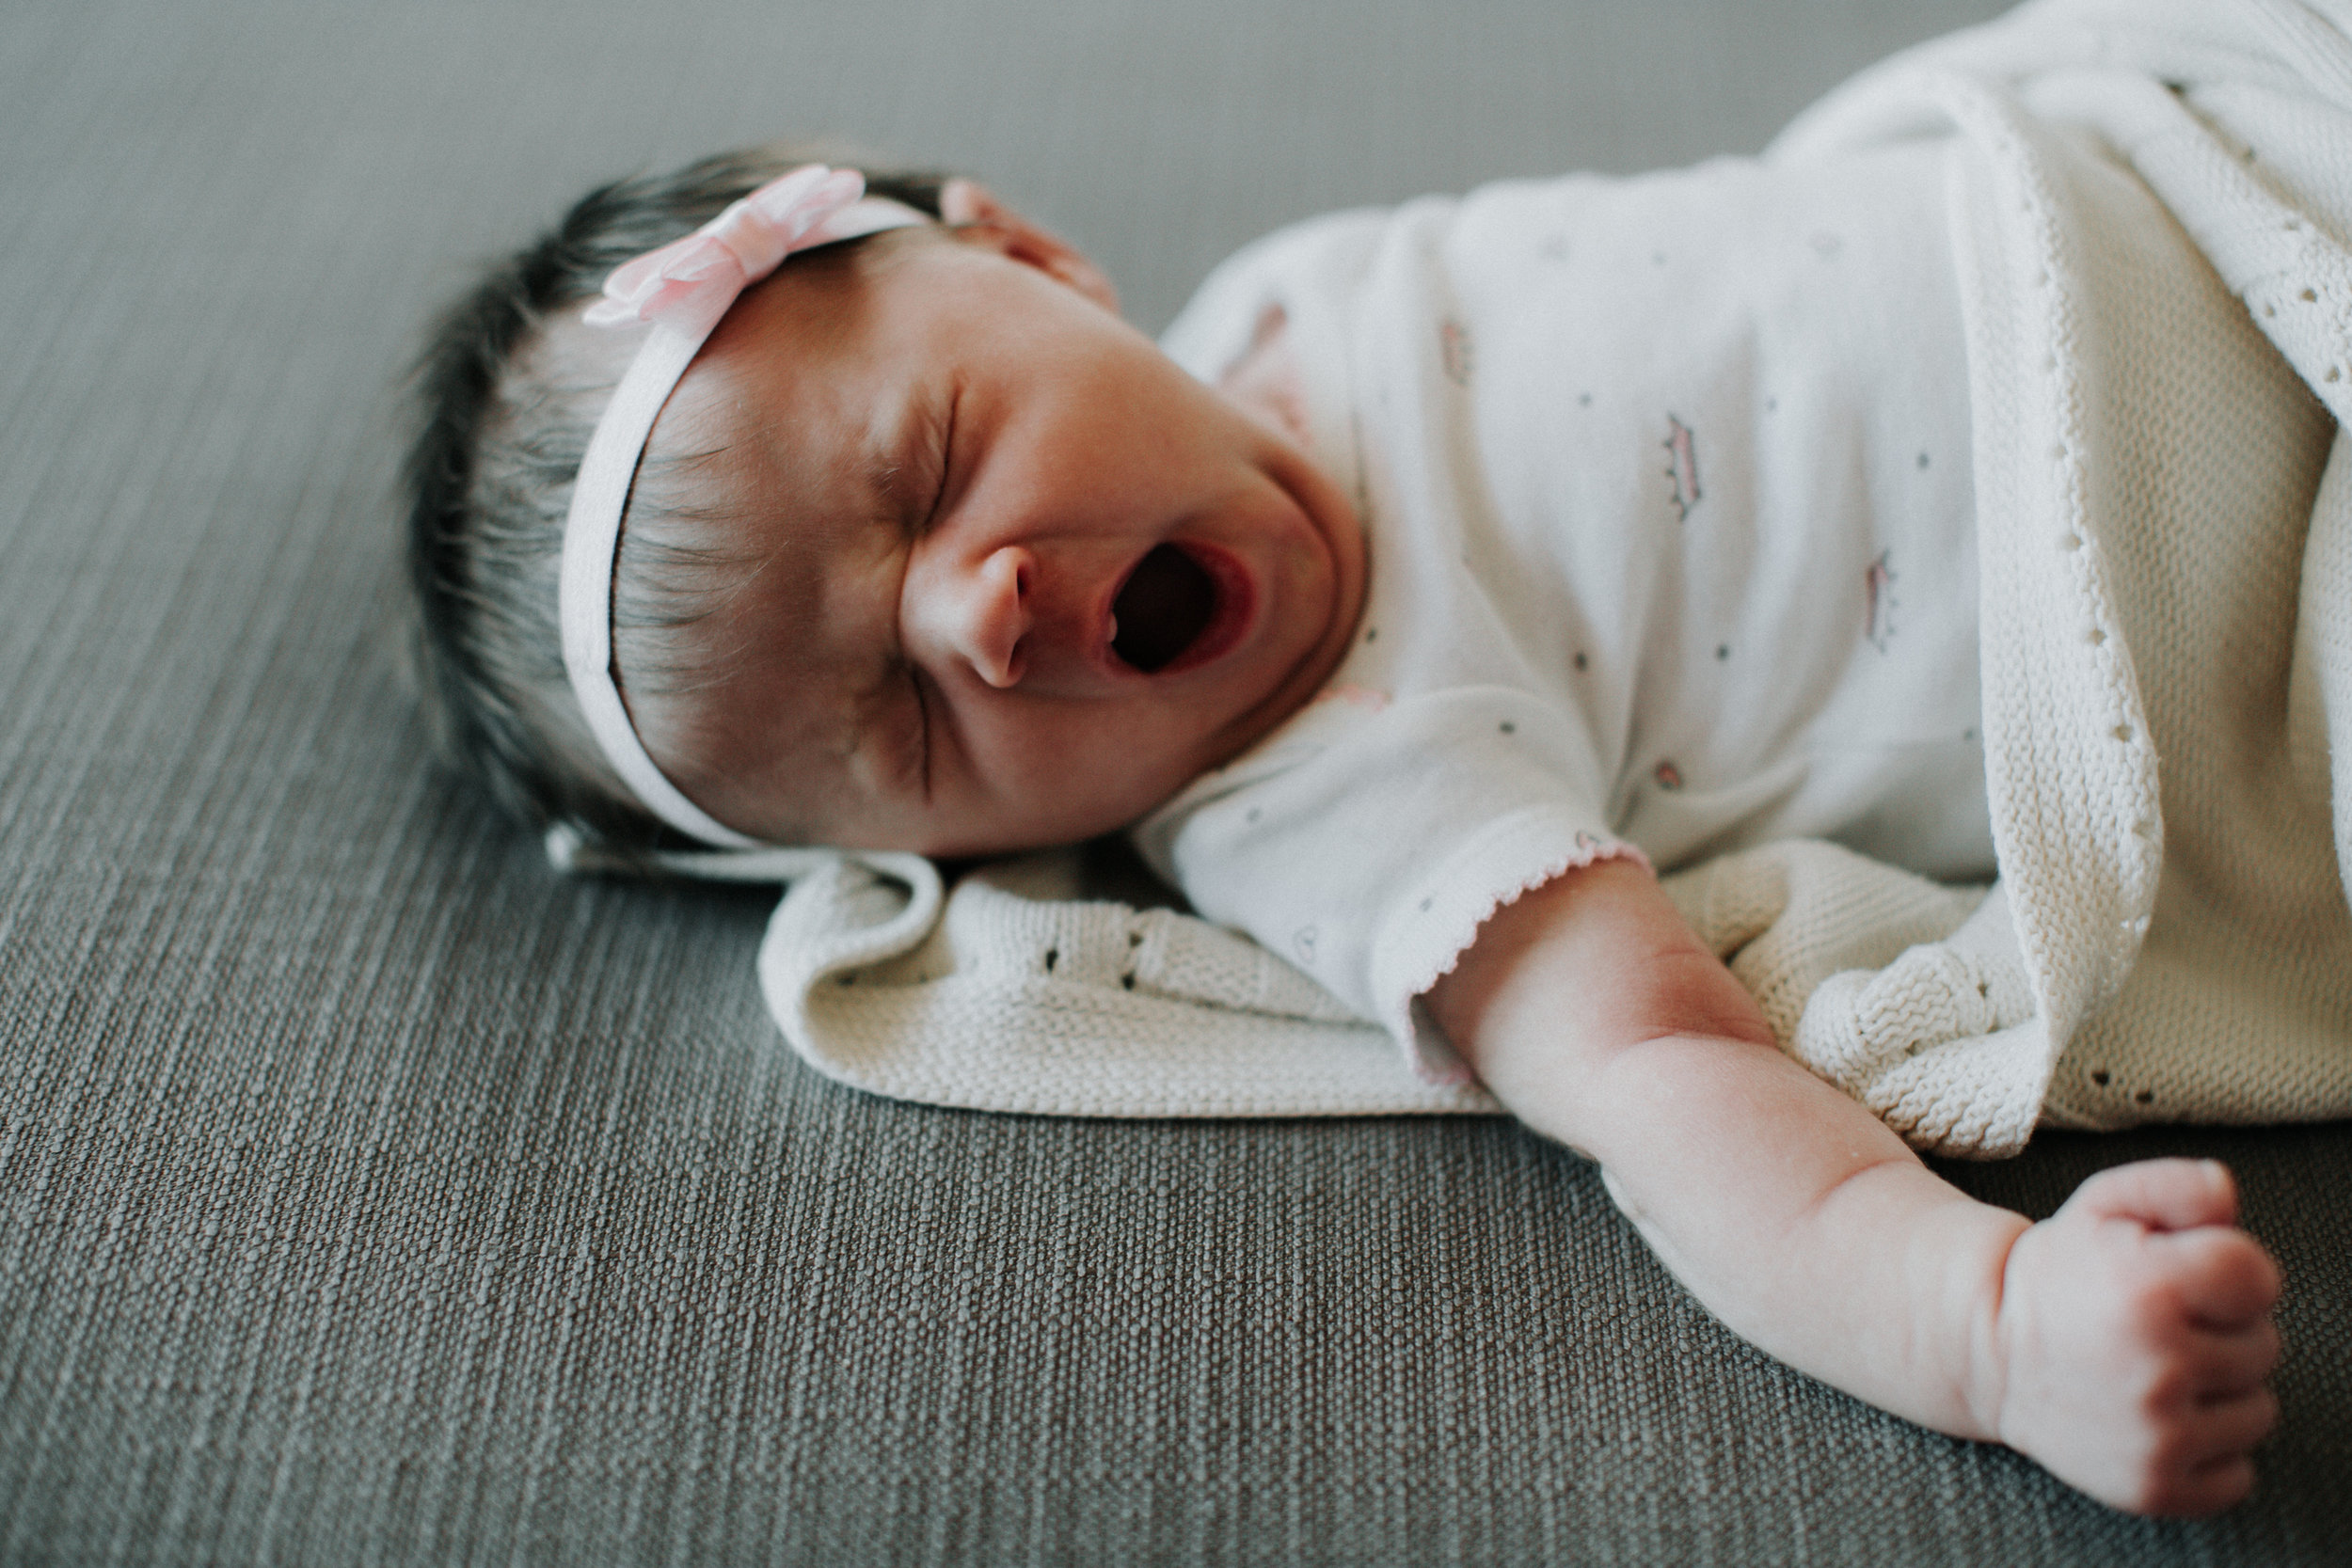 Newborn lifestyle session photographed by Brainerd Minnesota family photographer Britt DeZeeuw